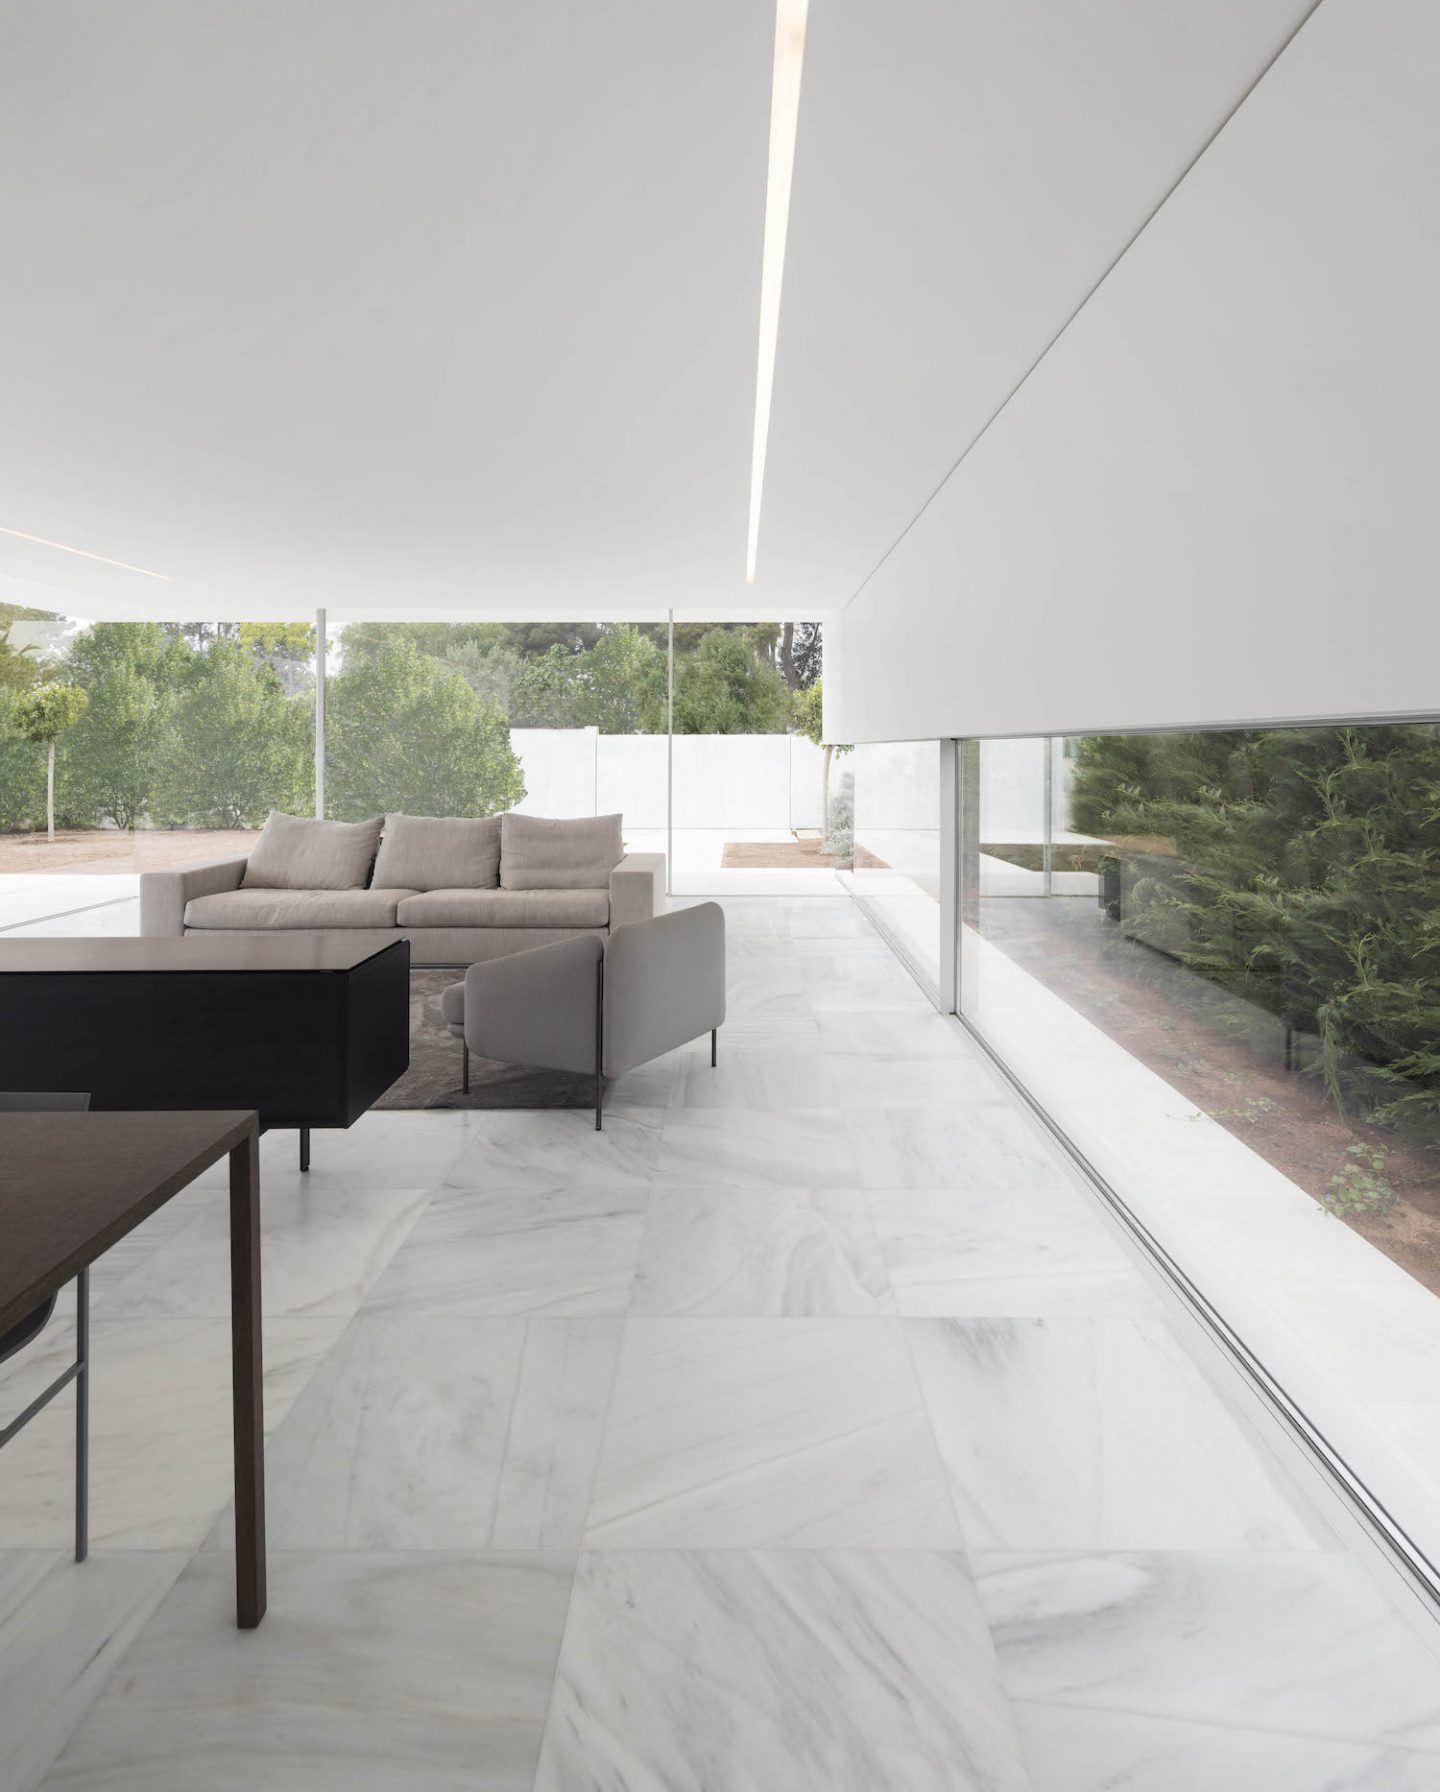 IGNANT-Architecture-Fran-Silvestre-Arquitectos-Hofmann-House-6